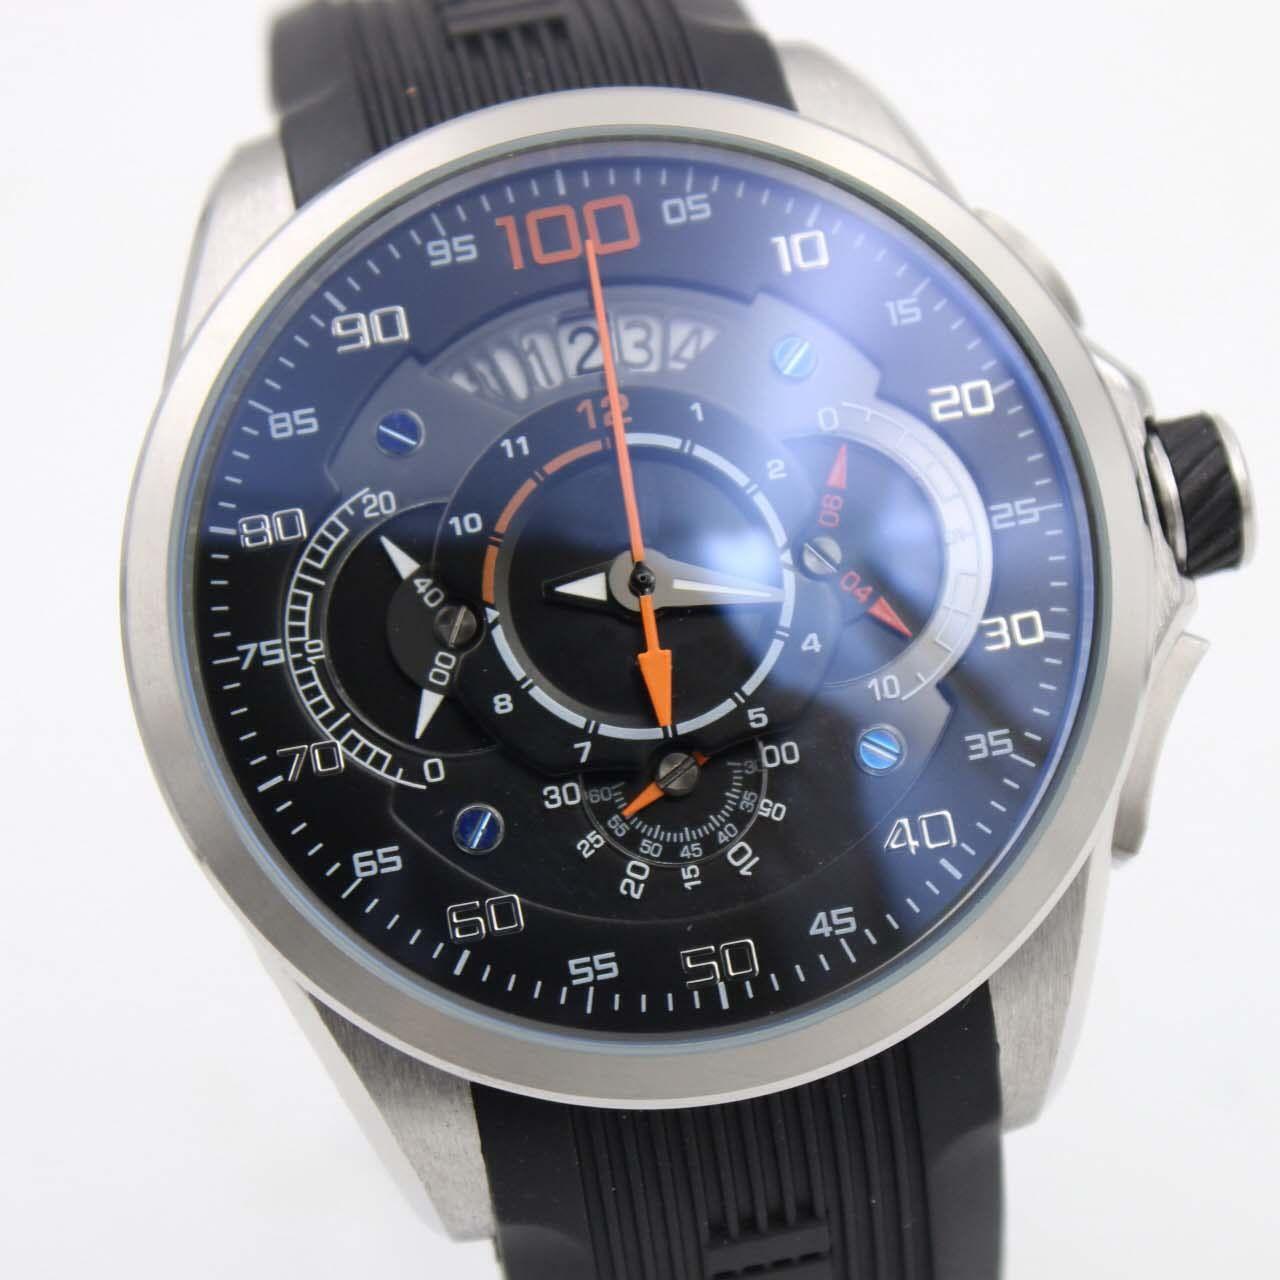 quartz chronograph wristwatch tachymeter calibre s mercedes benz sls